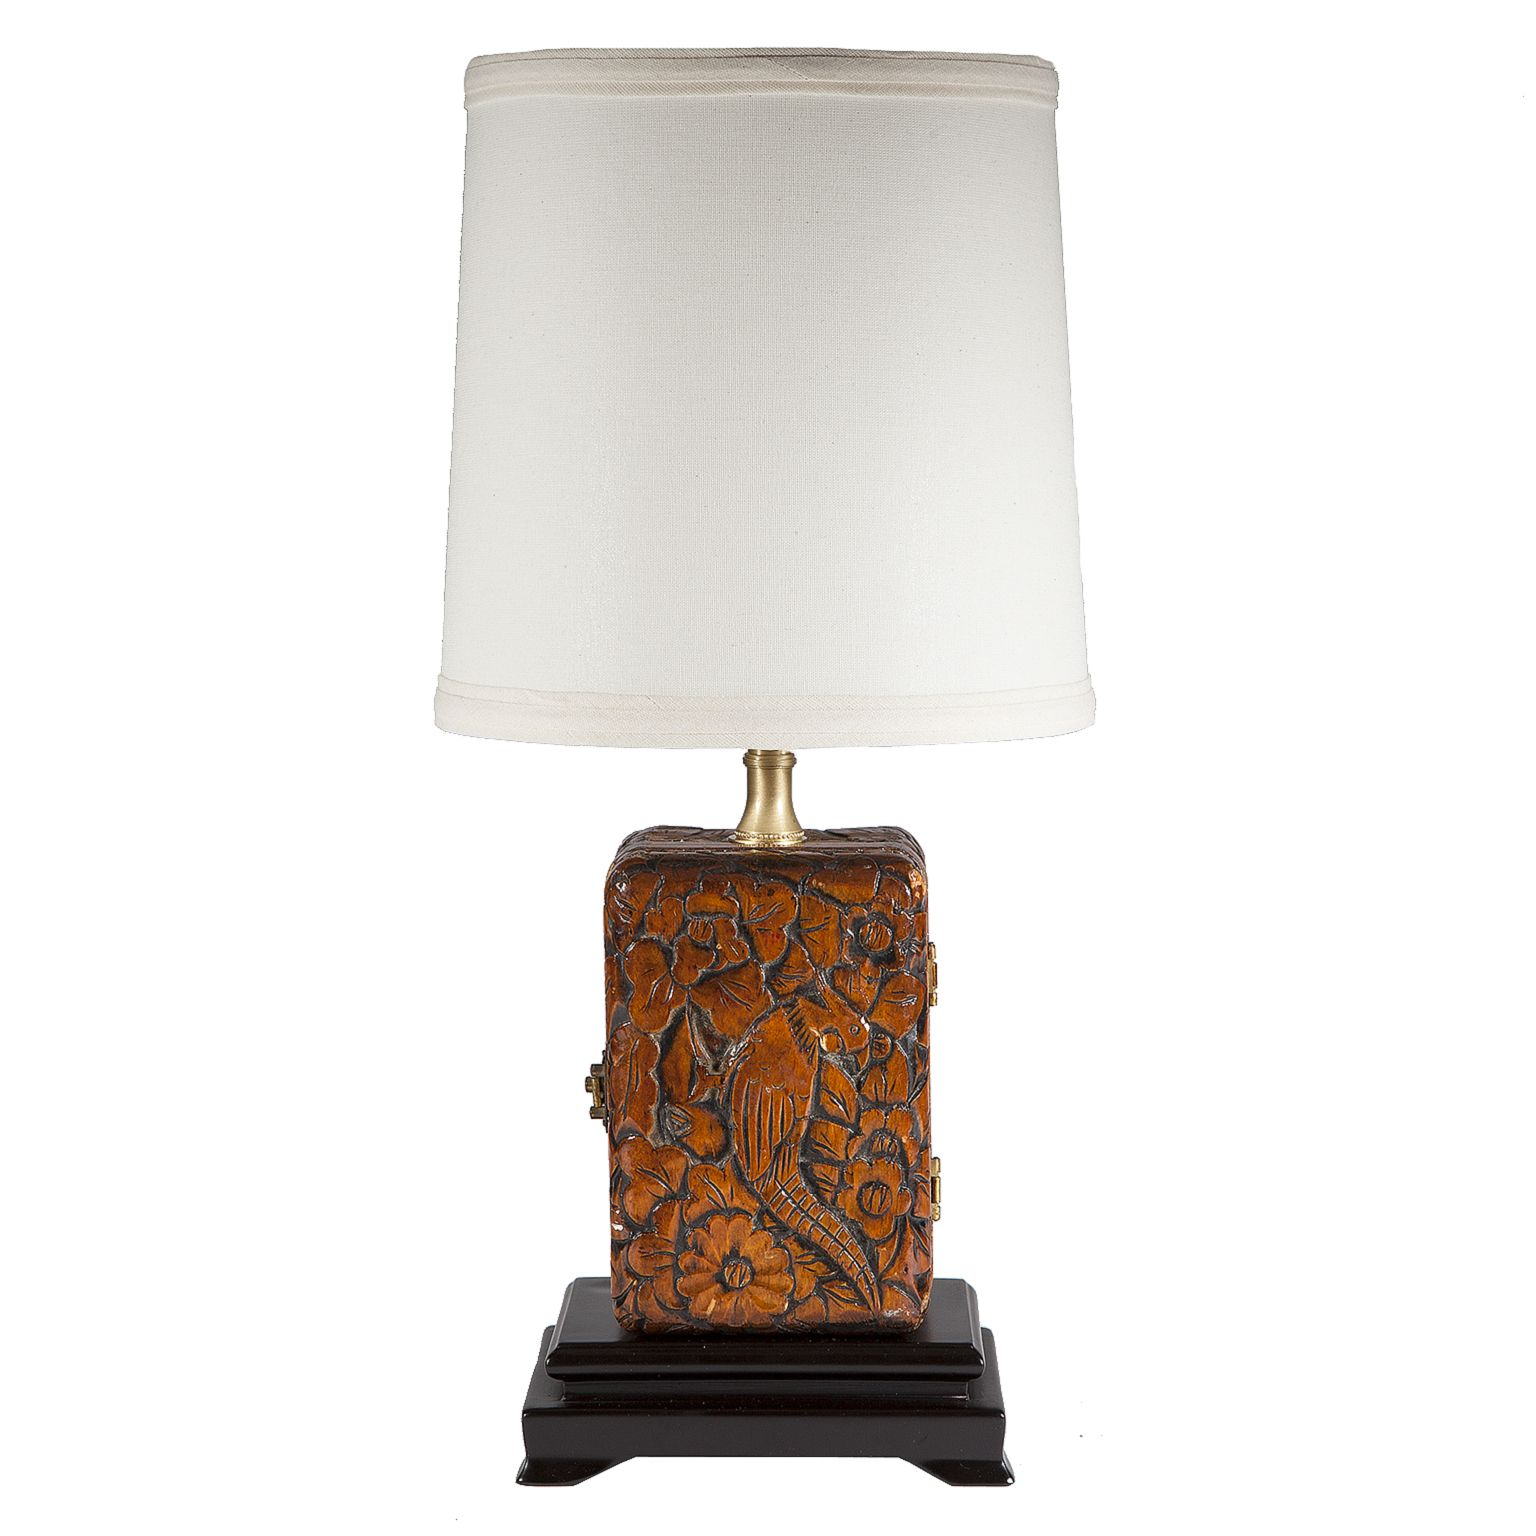 Custom Lamps | CustomMade.com